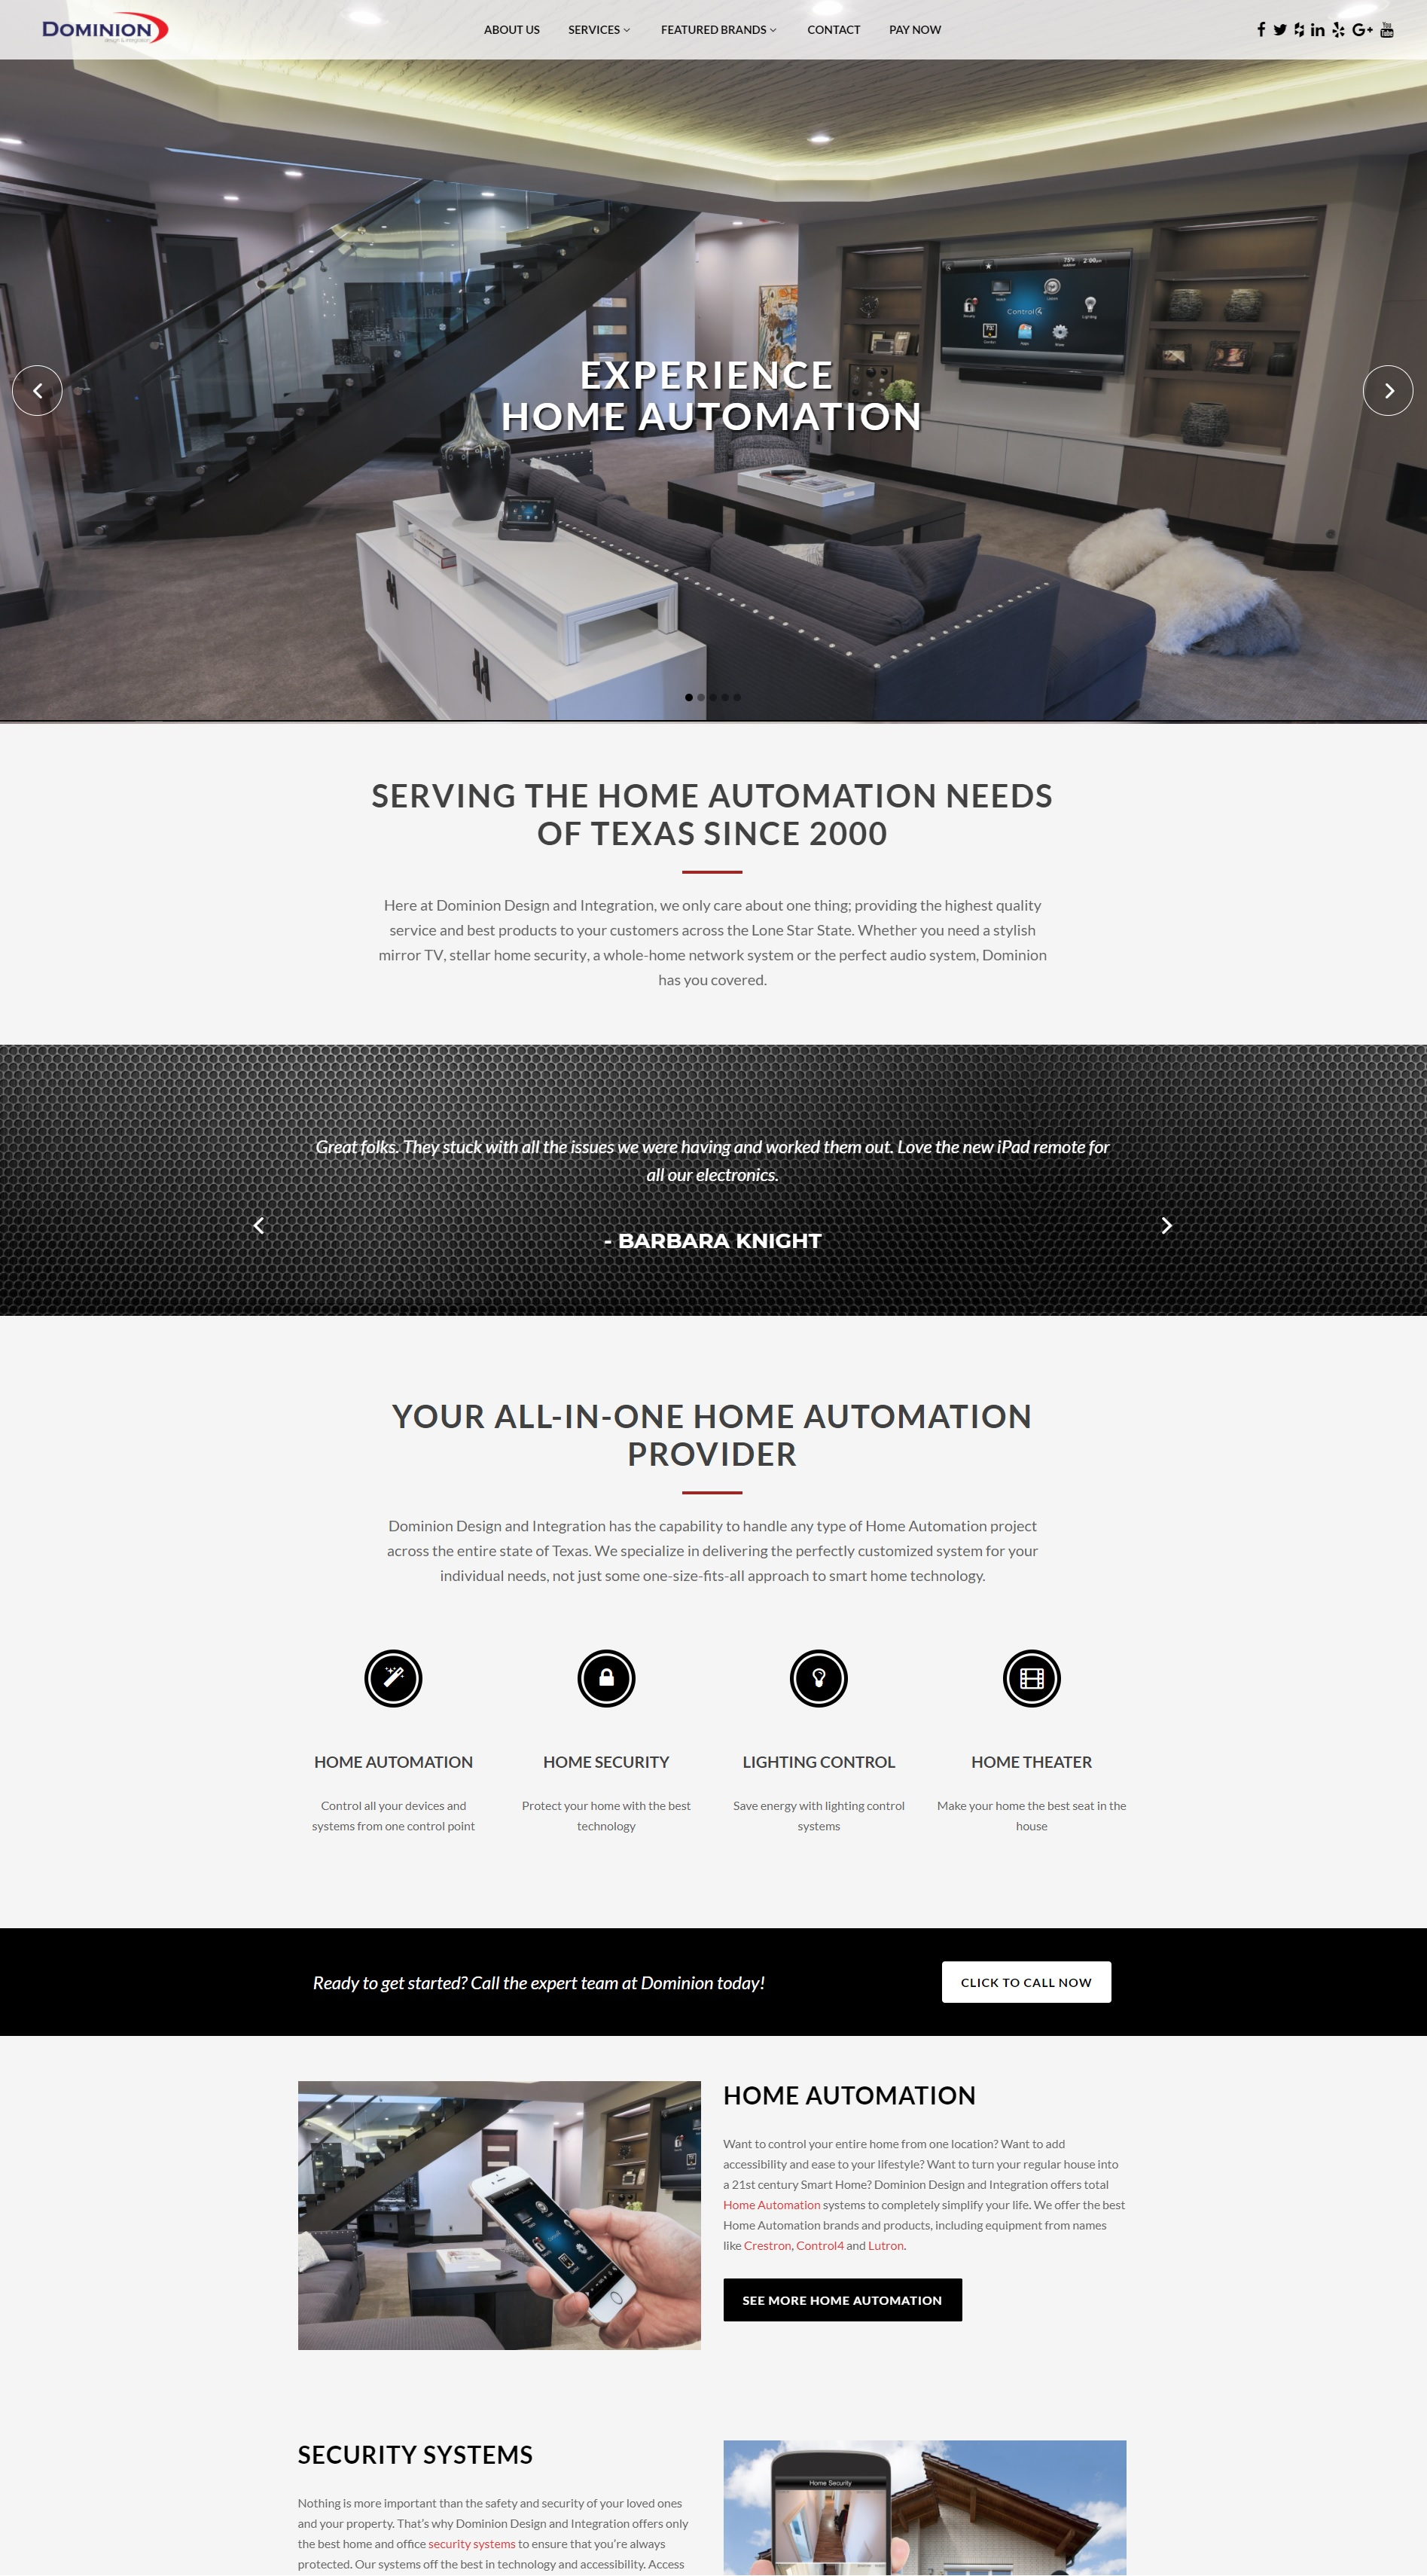 Web Design San Antonio Affordable Website Developer